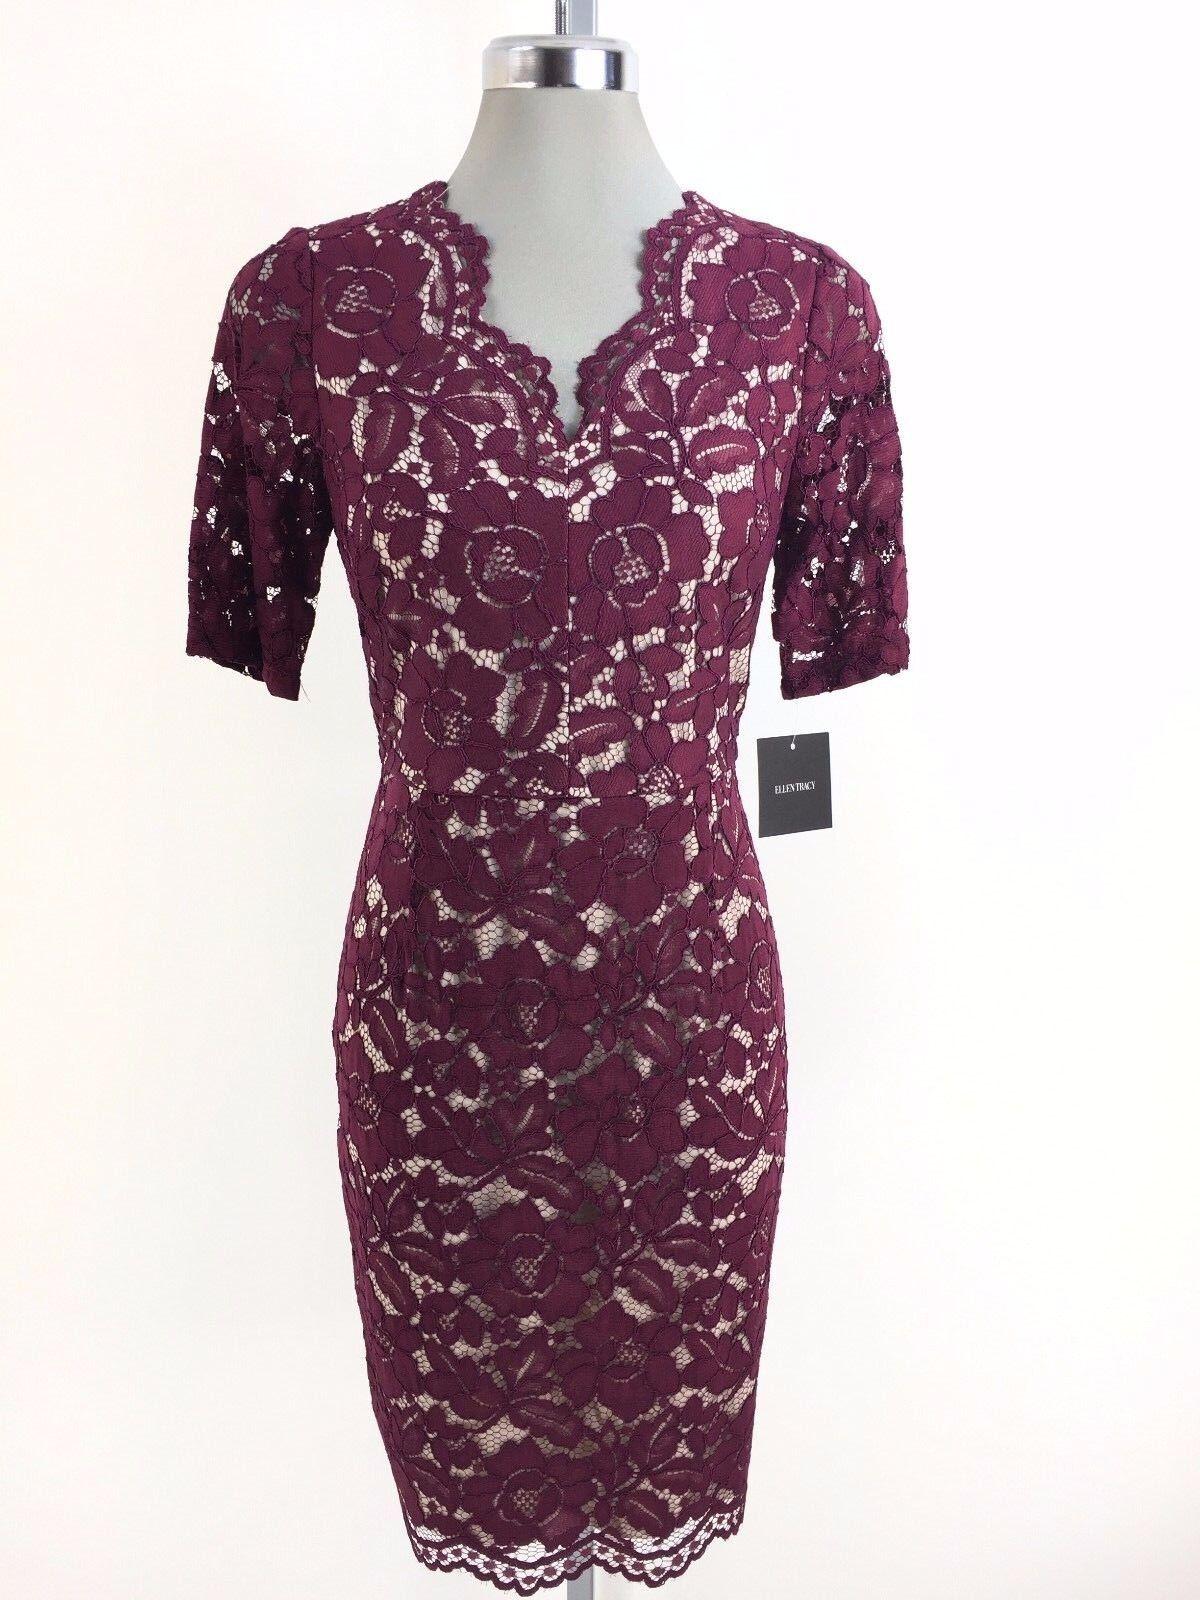 Ellen Tracy NWT Elegant MERLOT Scallop Lace Dress, size 4